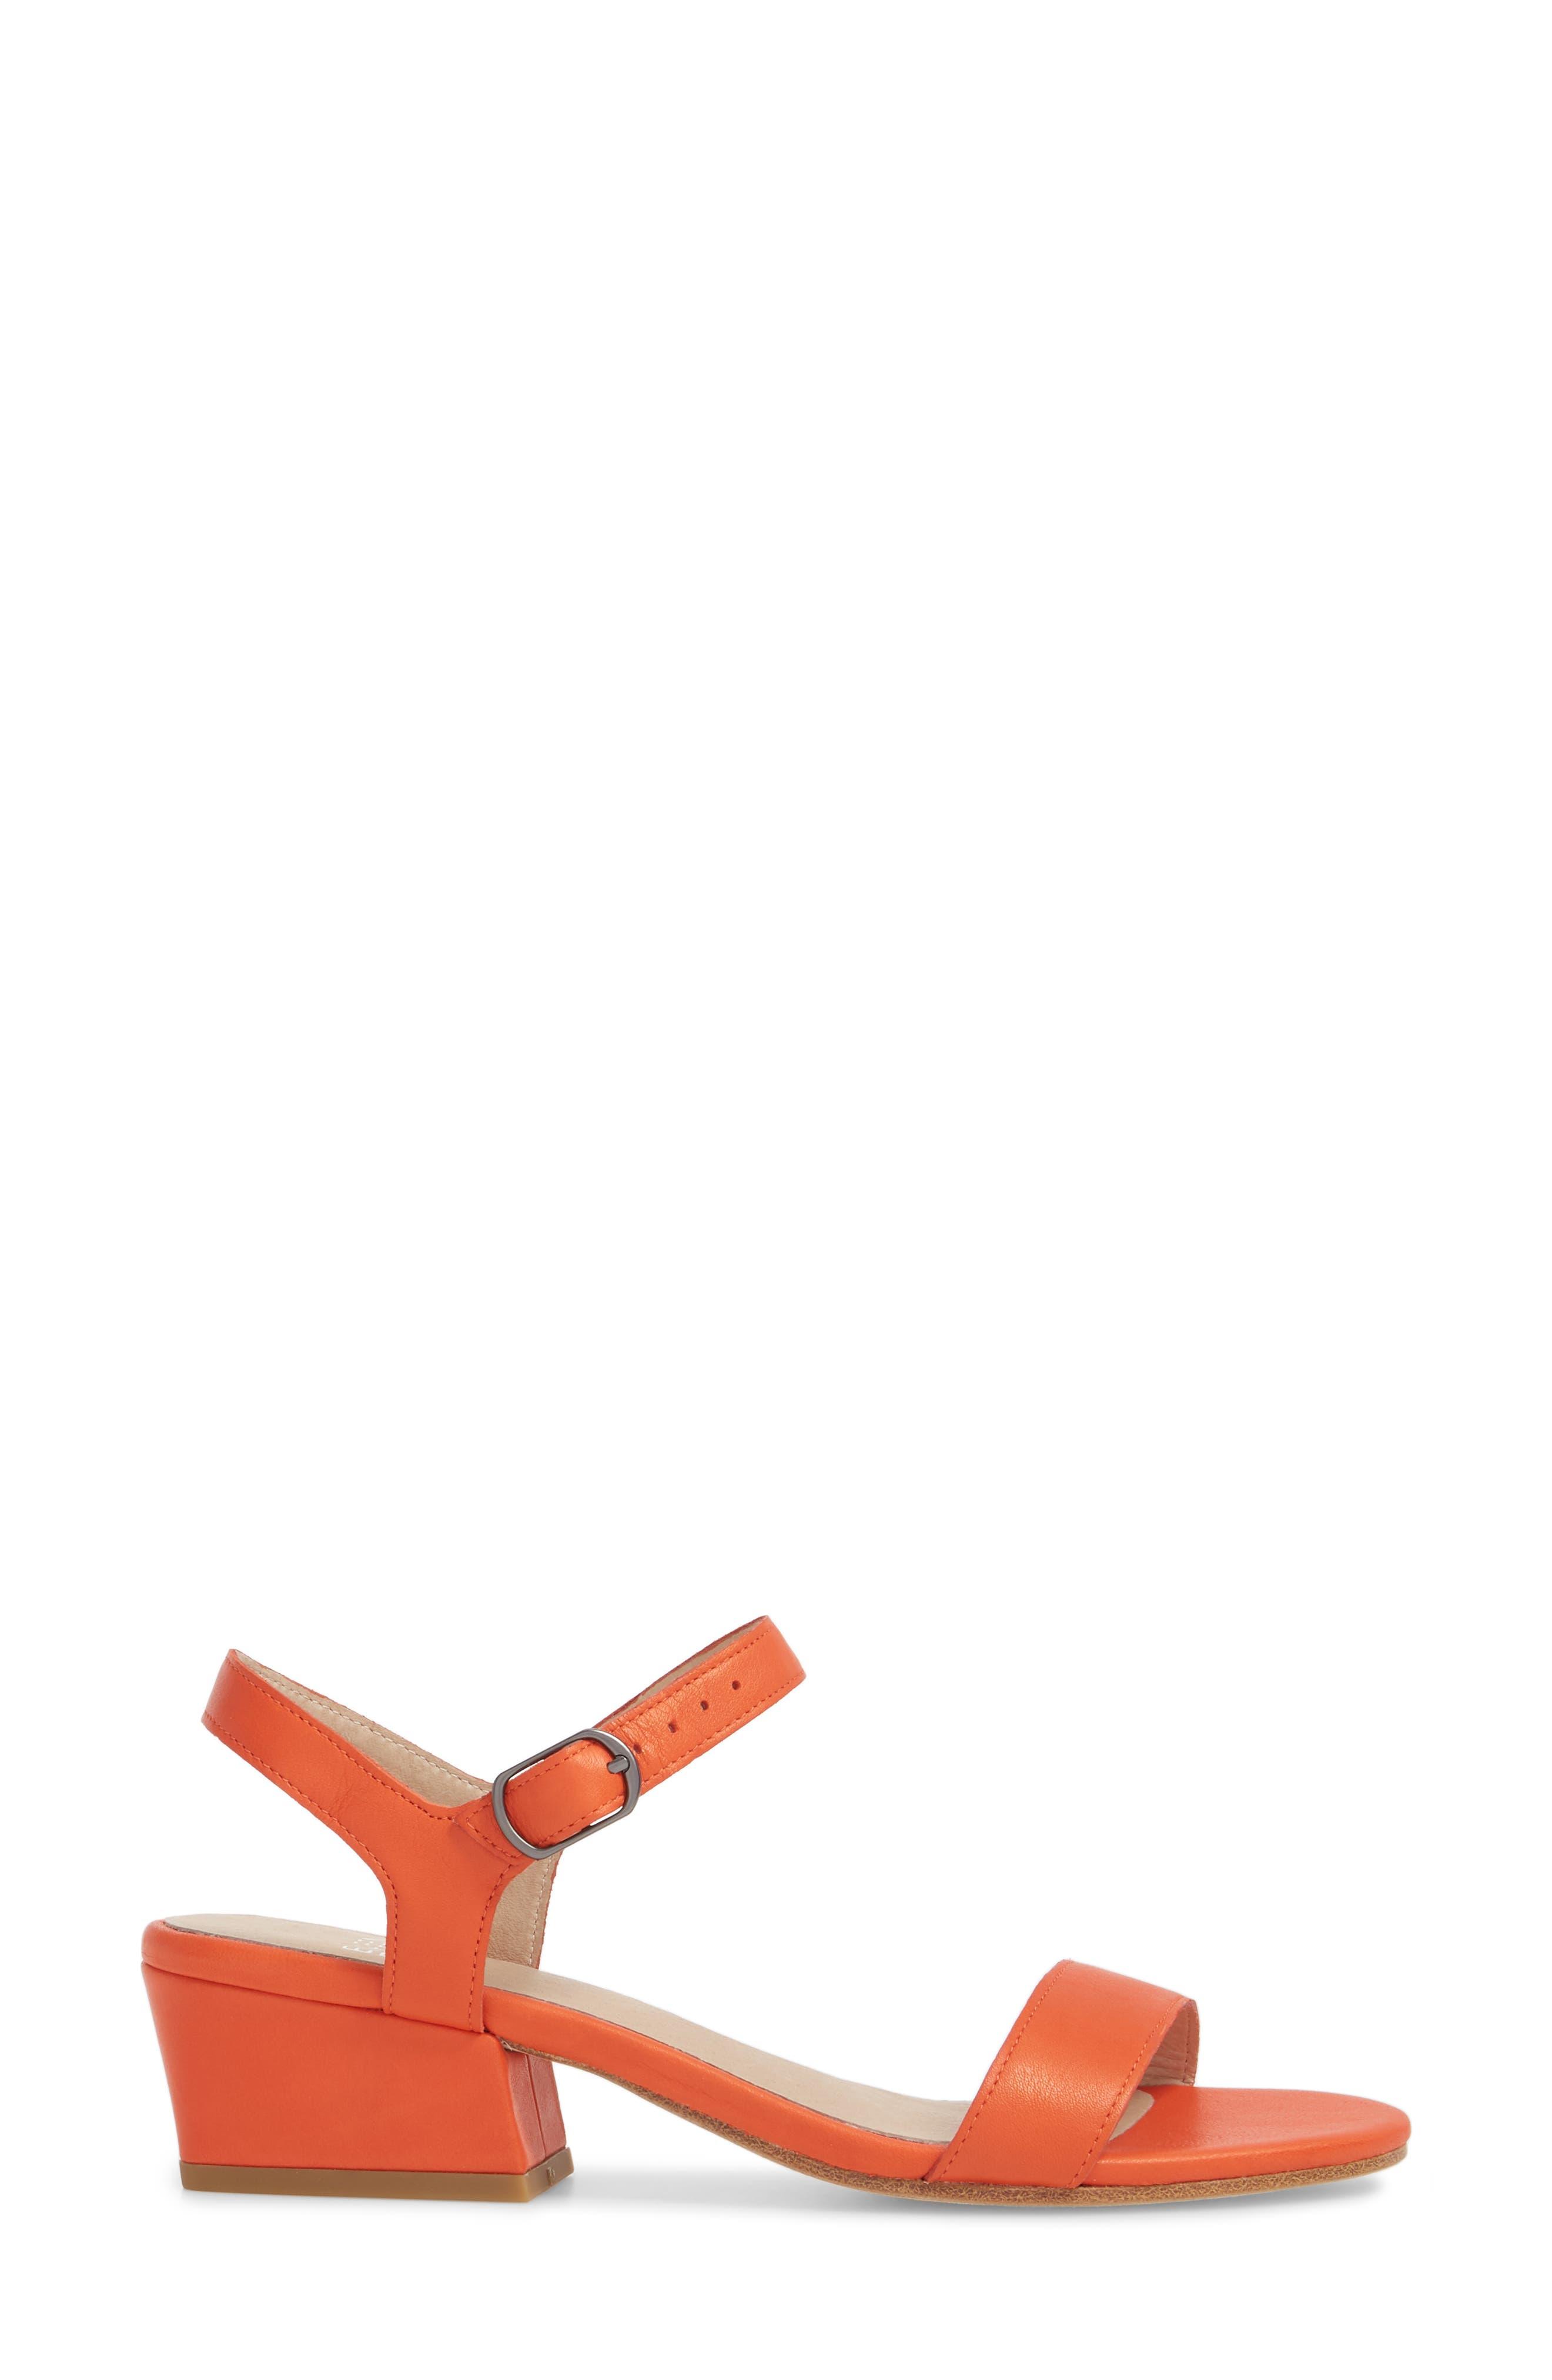 Olean Quarter Strap Sandal,                             Alternate thumbnail 3, color,                             Blood Orange Leather